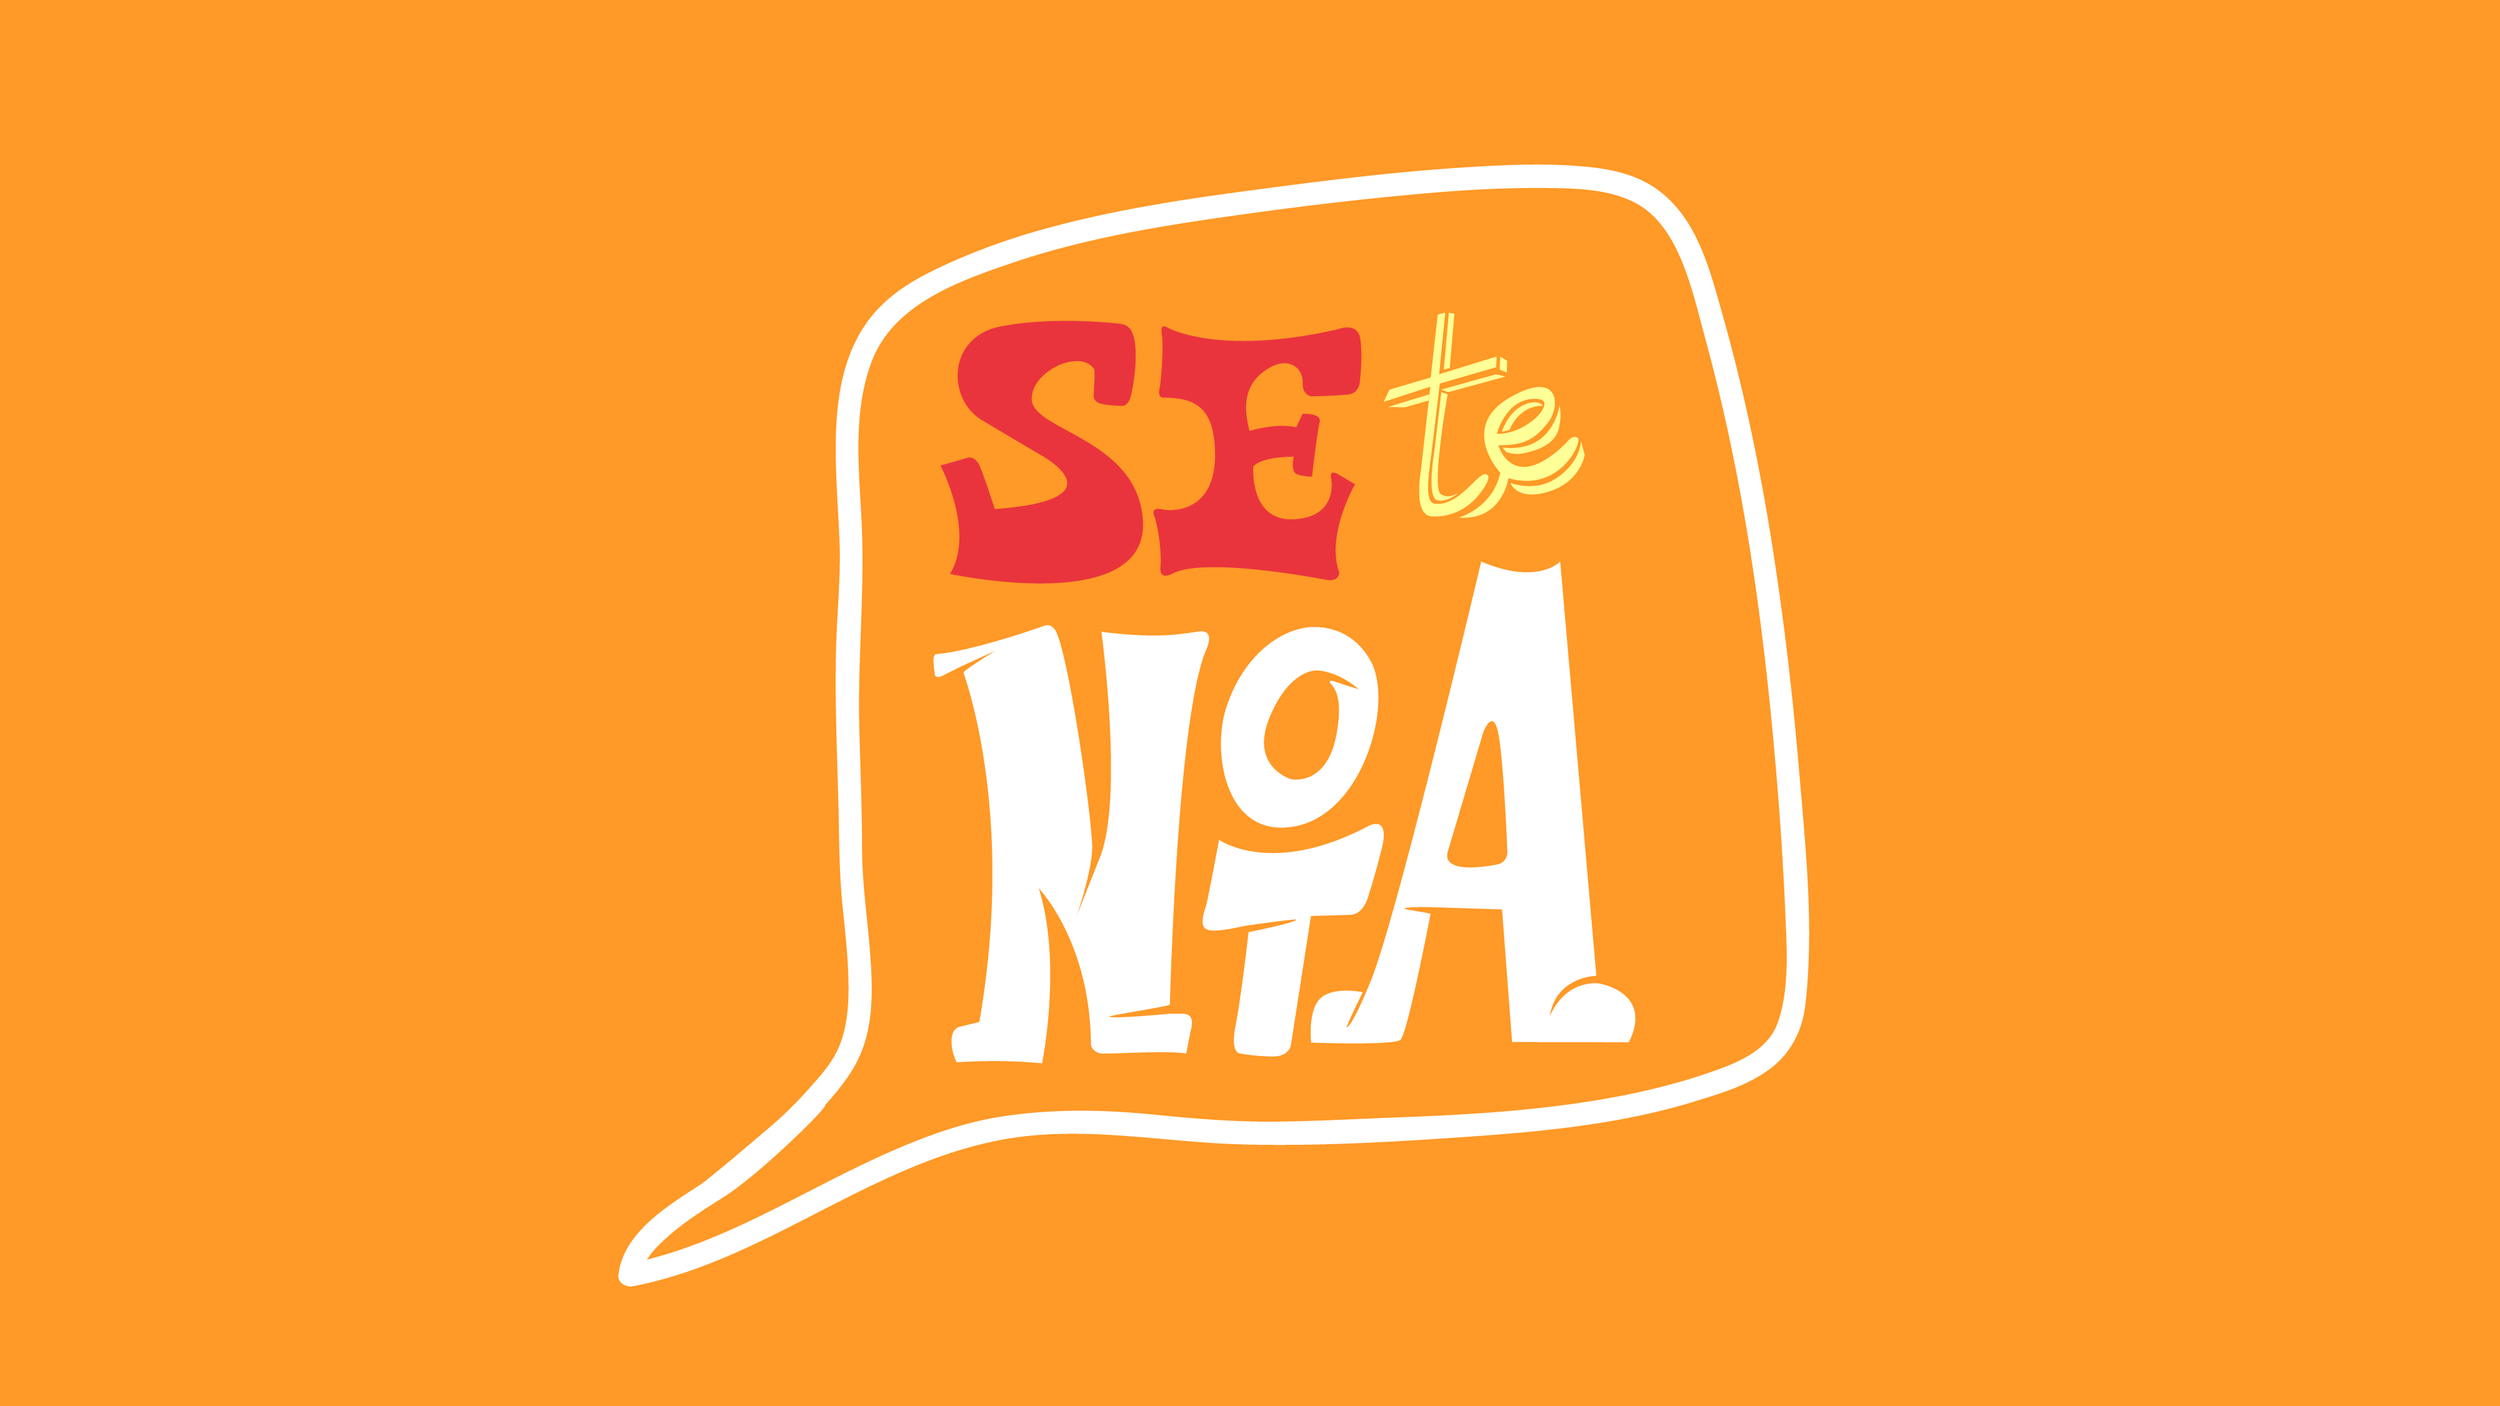 Se Te Nota-01.png